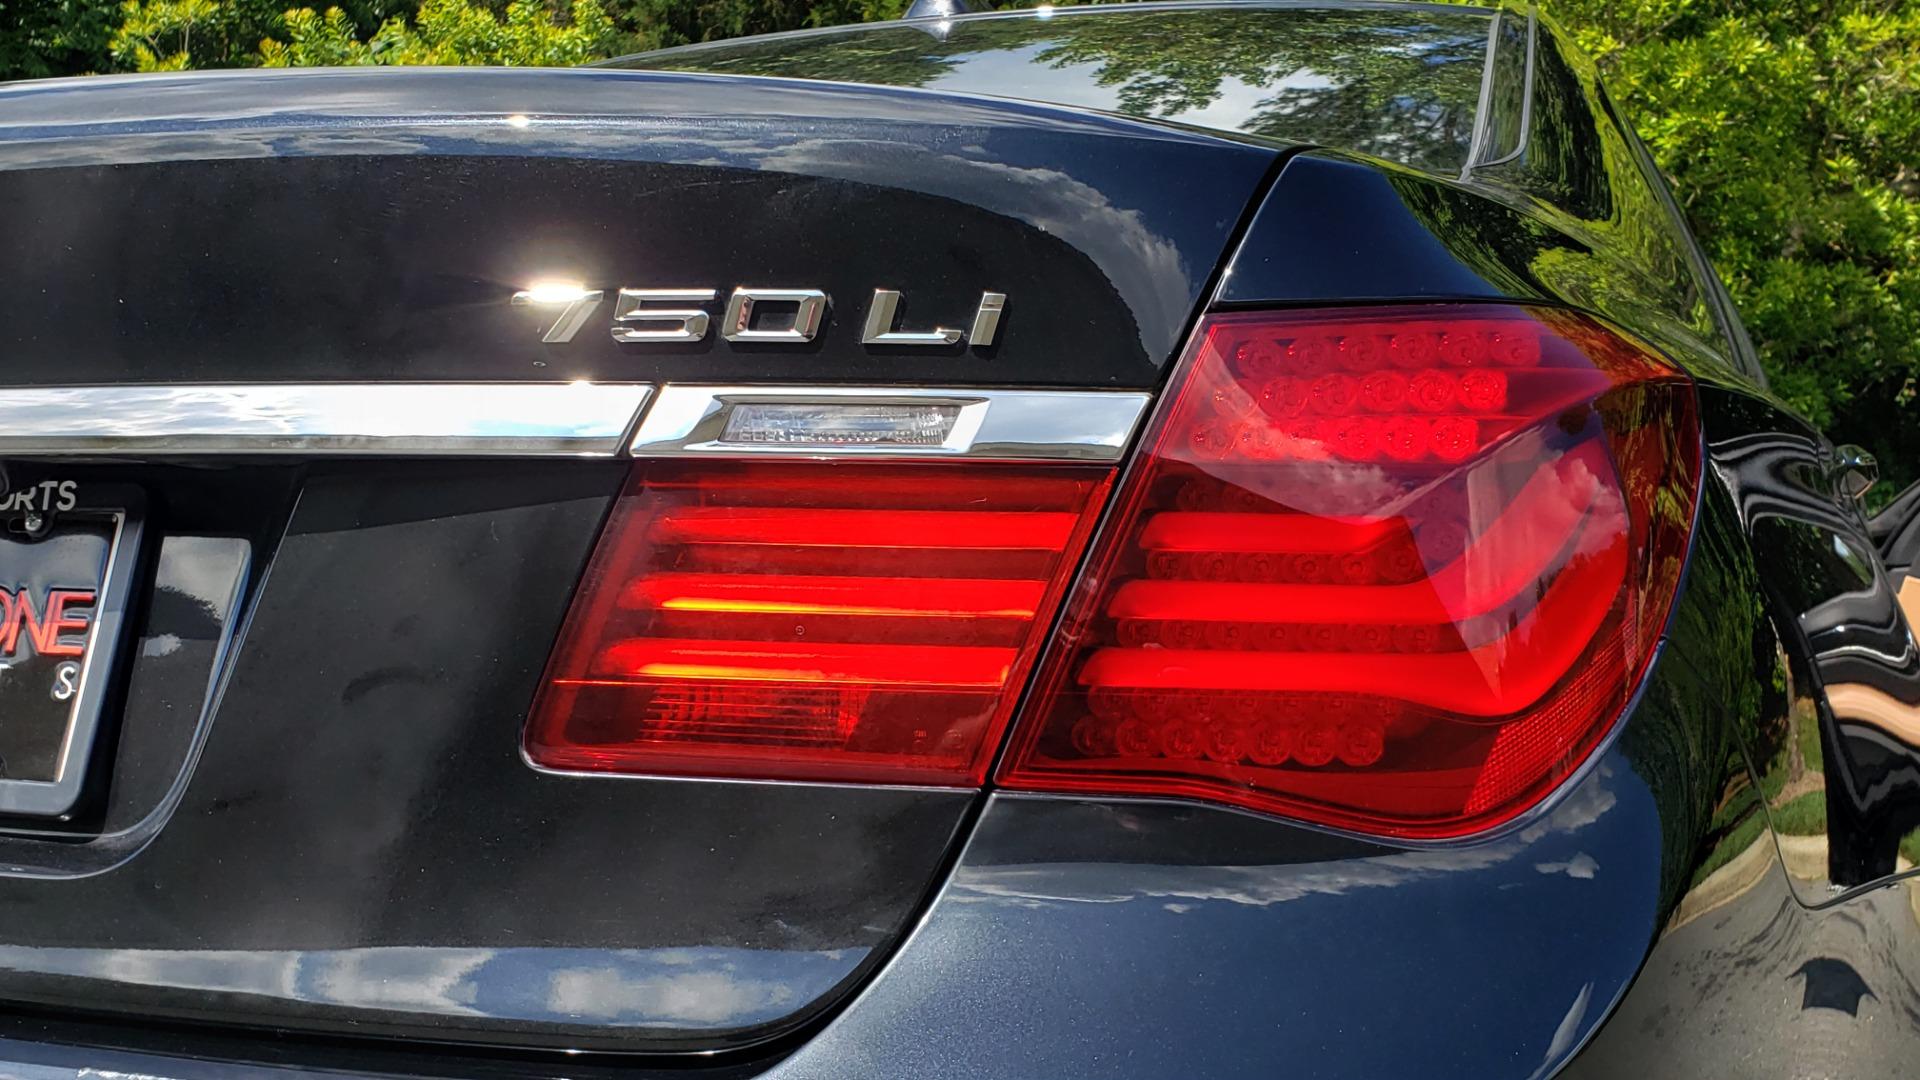 Used 2014 BMW 7 SERIES 750LI M-SPORT / EXEC PKG / DRVR ASST / LIGHTING / NAV / SUNROOF for sale Sold at Formula Imports in Charlotte NC 28227 27